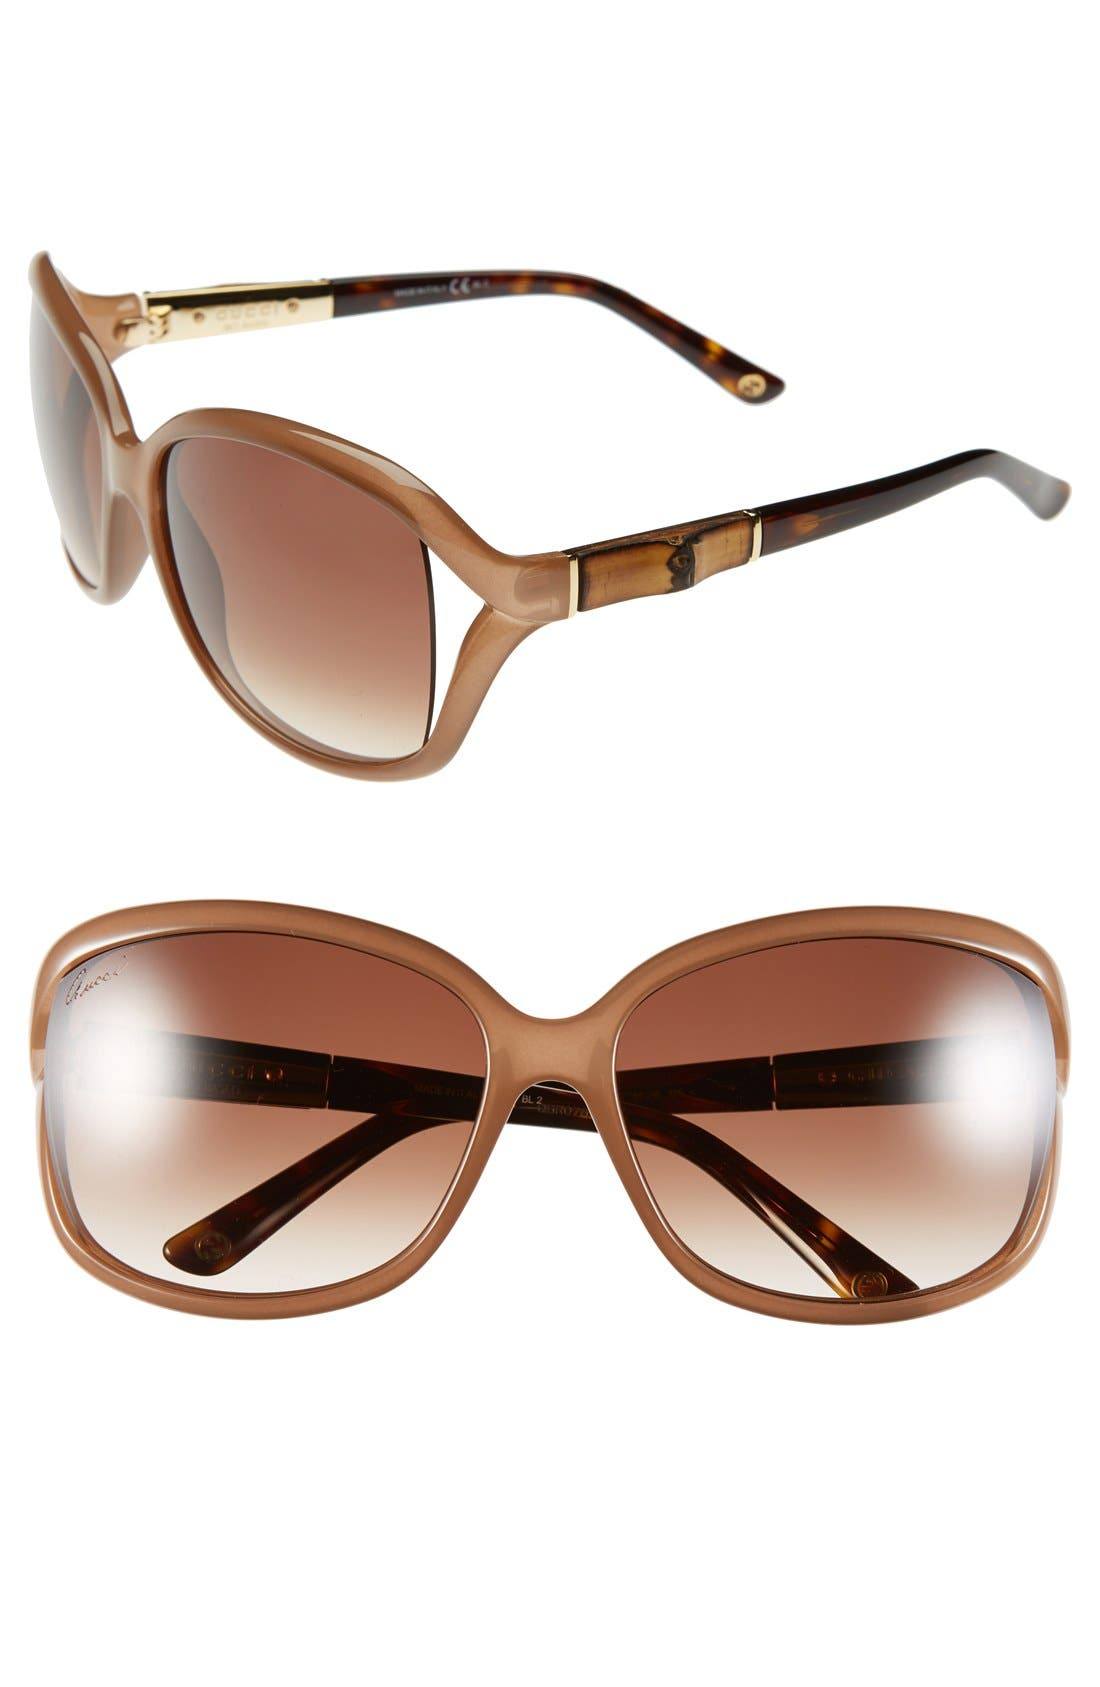 Main Image - Gucci 61mm Oversized Bamboo Temple Sunglasses